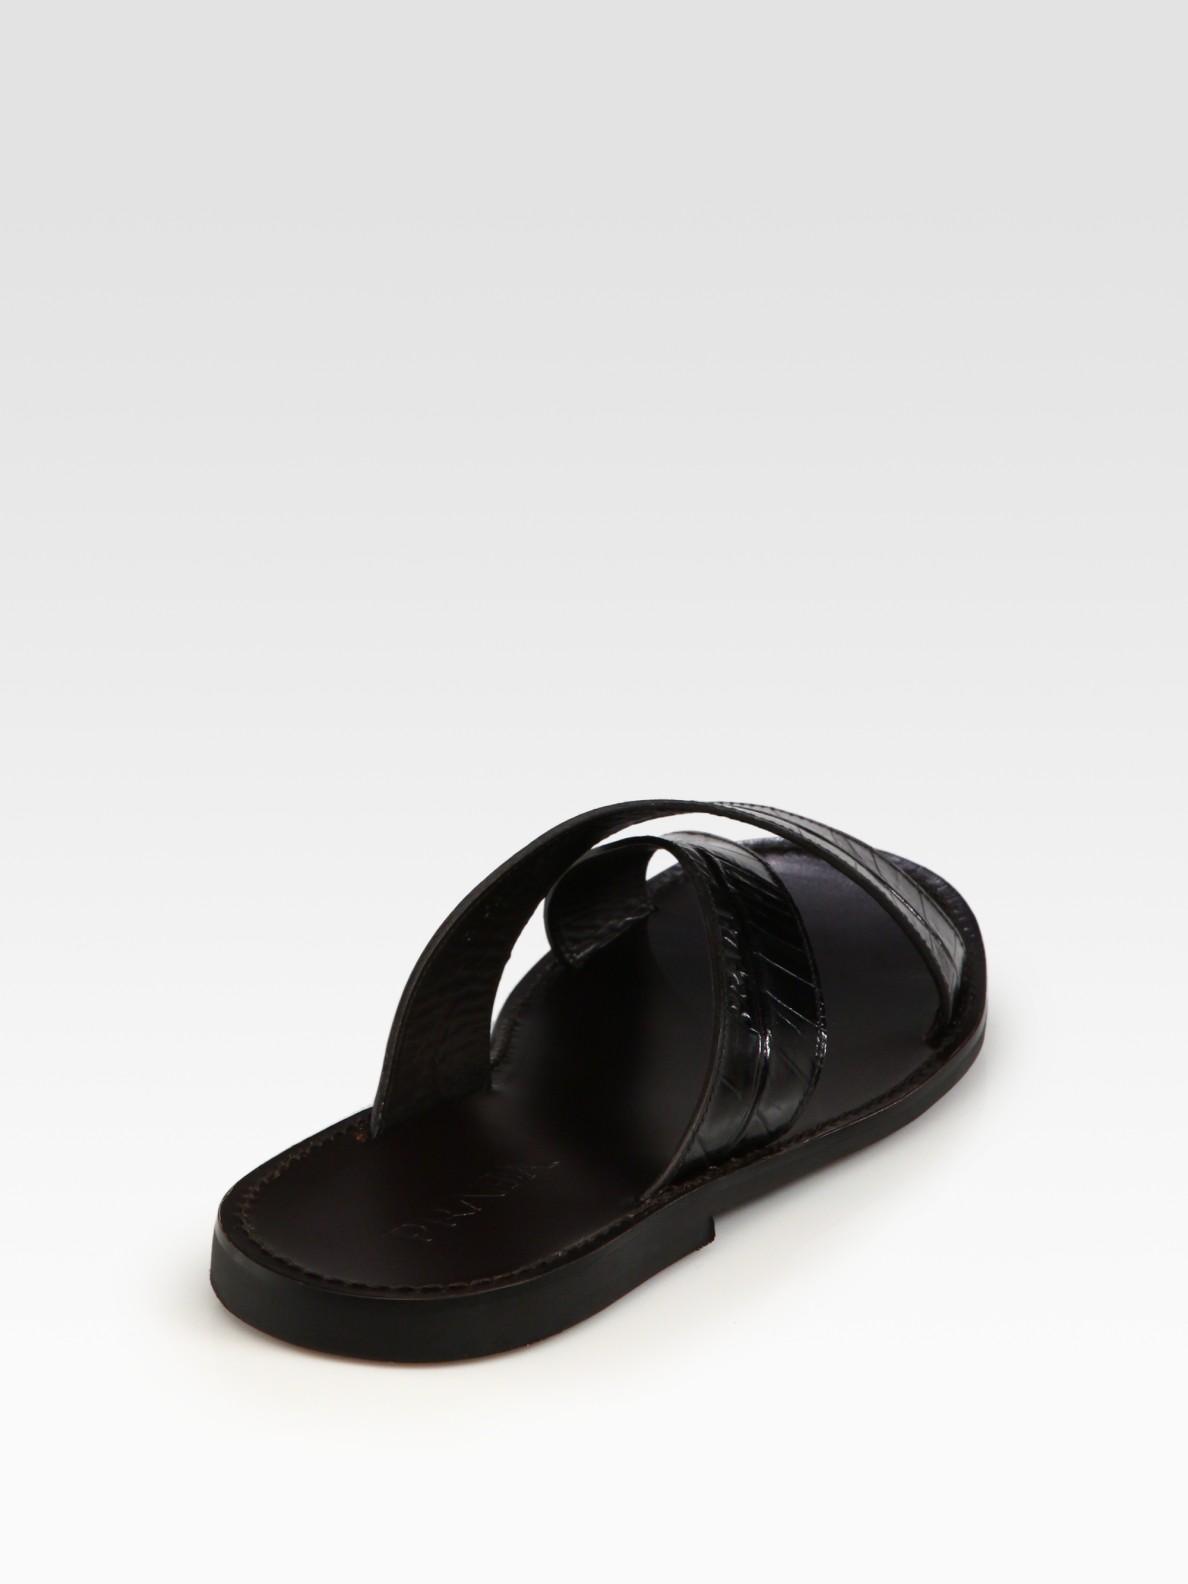 5834928006f342 Lyst - Prada Criss Cross Sandals in Black for Men